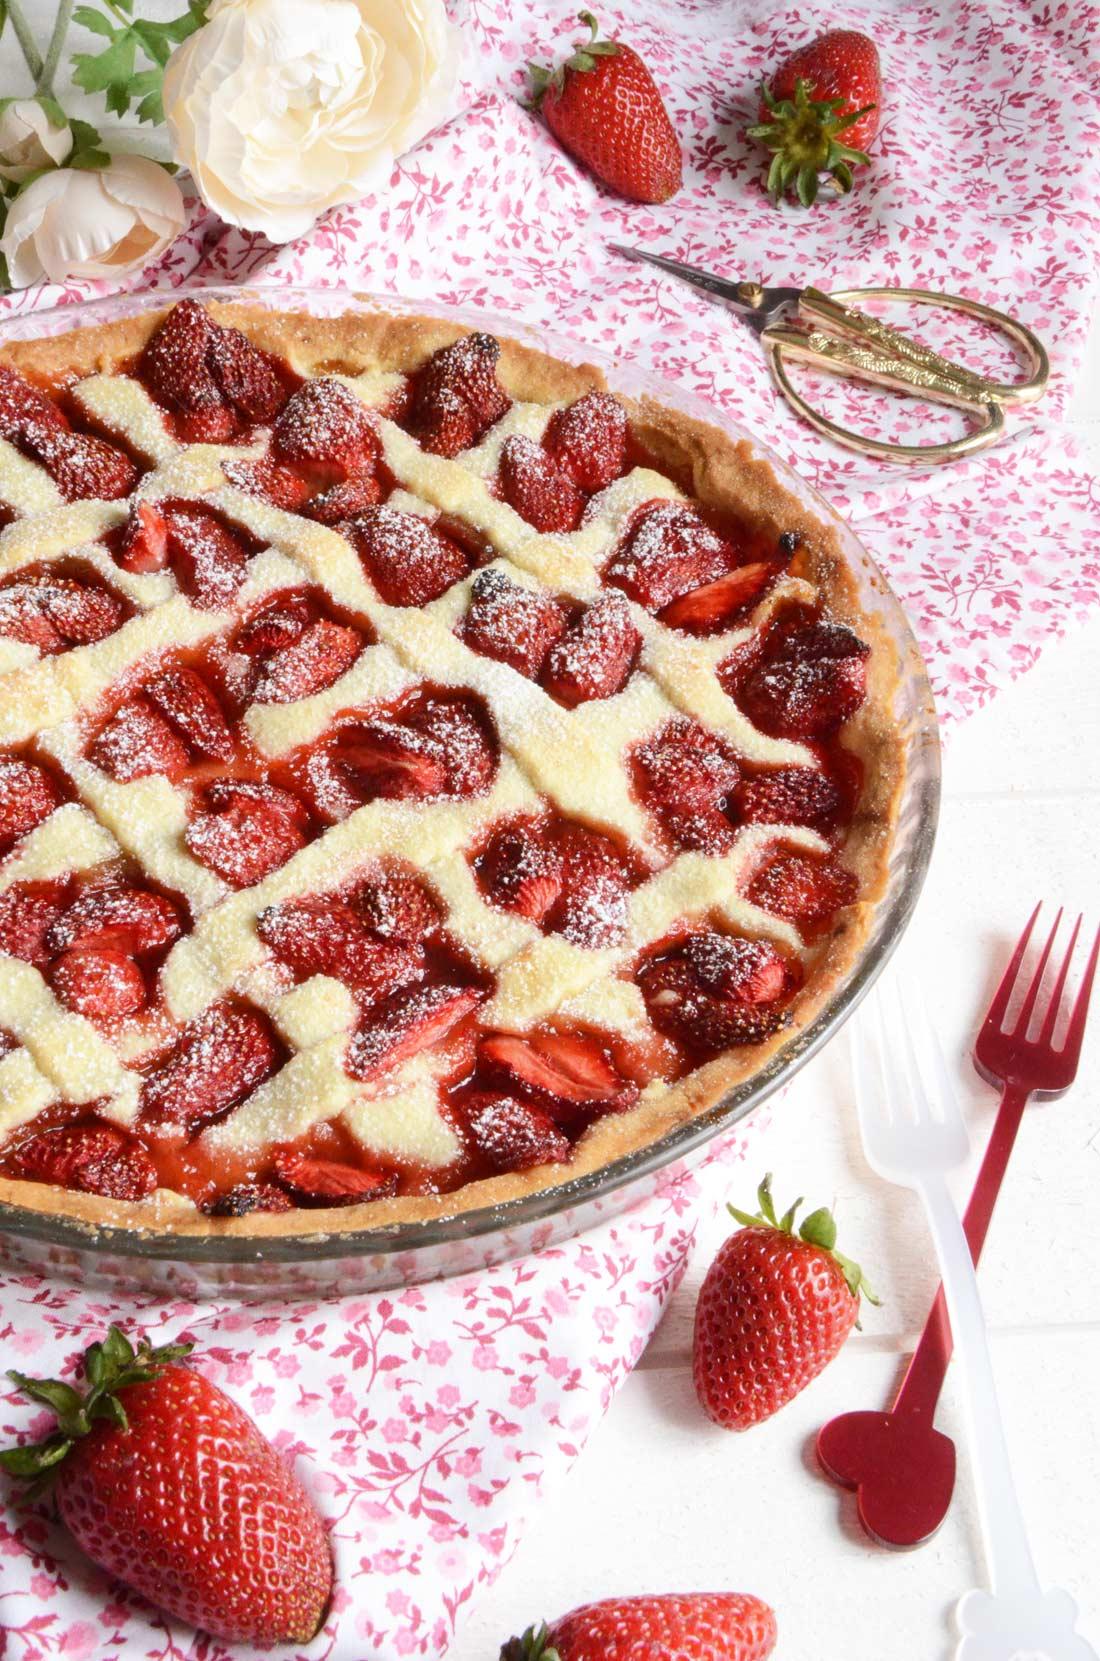 Délicieuse tarte rhubarbe fraises fait maison